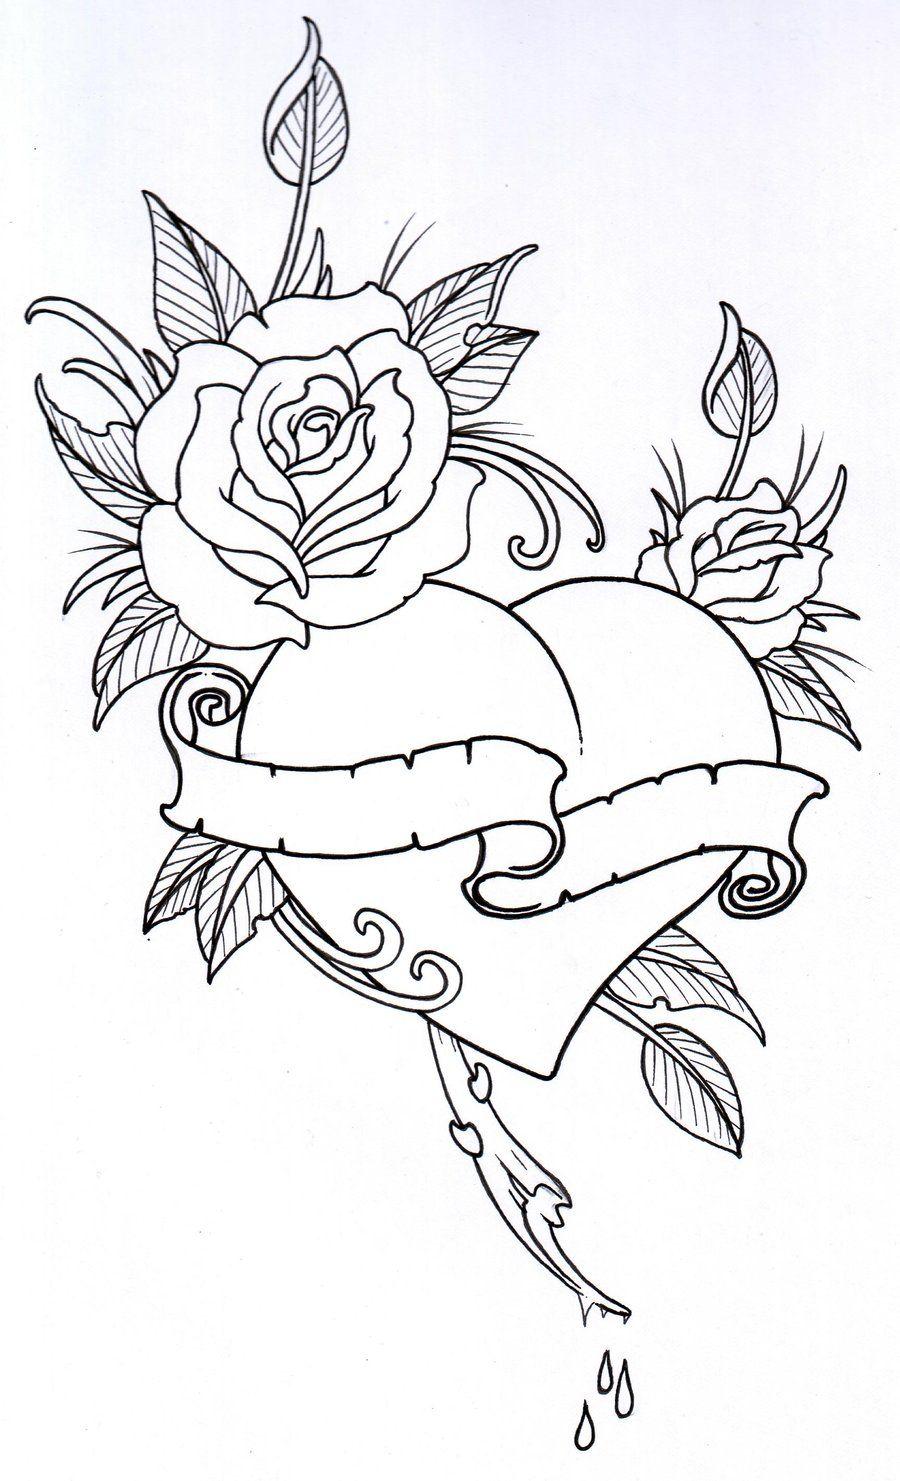 Knife Heart Tattoo Designs